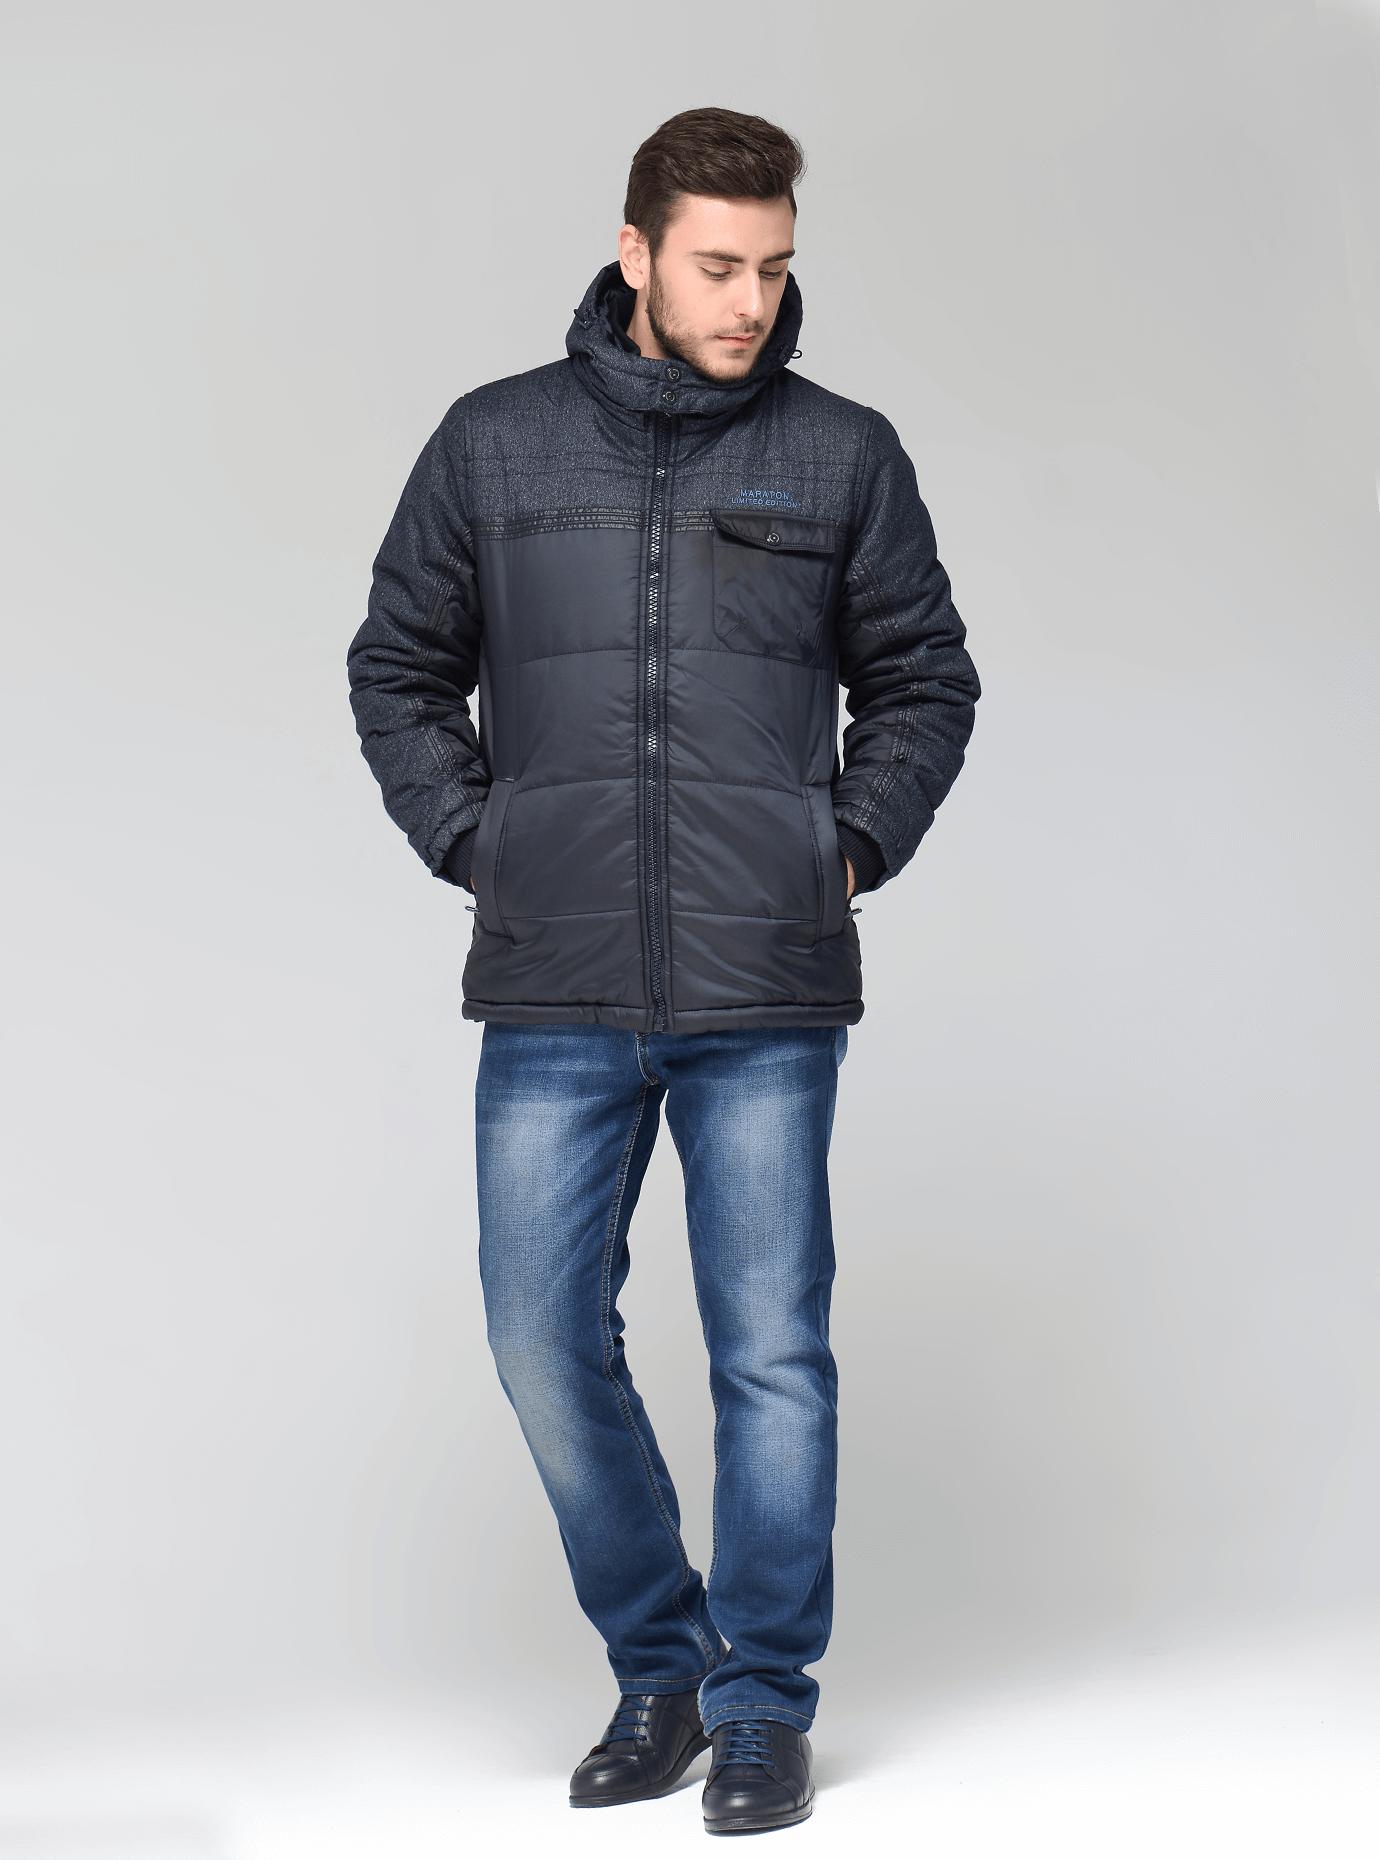 Зимняя мужская куртка Синий S (01-RR17034): фото - Alster.ua